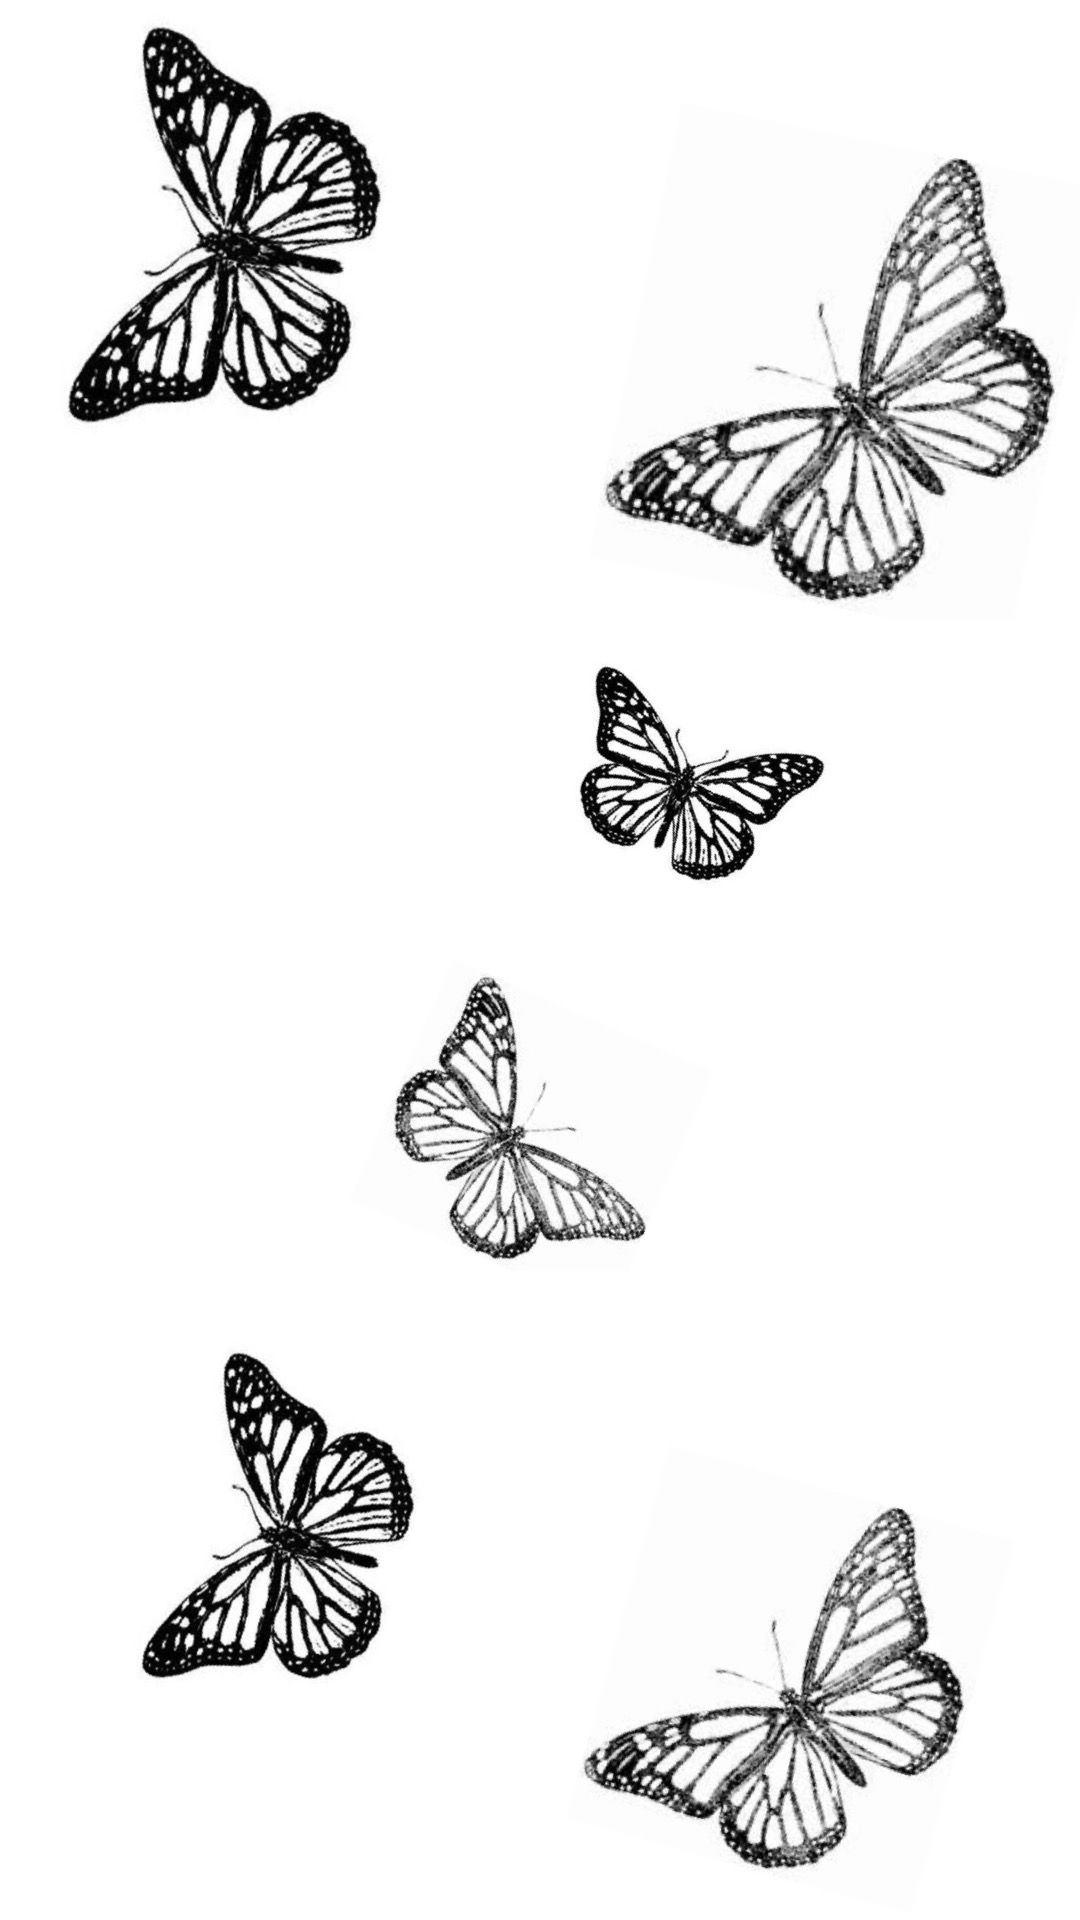 Butterfly Effect In 2020 Aesthetic Iphone Wallpaper Butterfly Wallpaper Butterfly Wallpaper Iphone